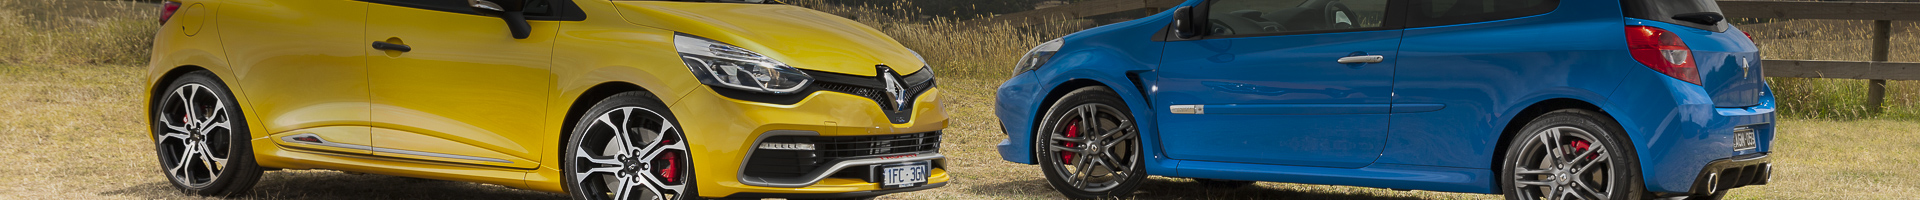 Renault forums australia